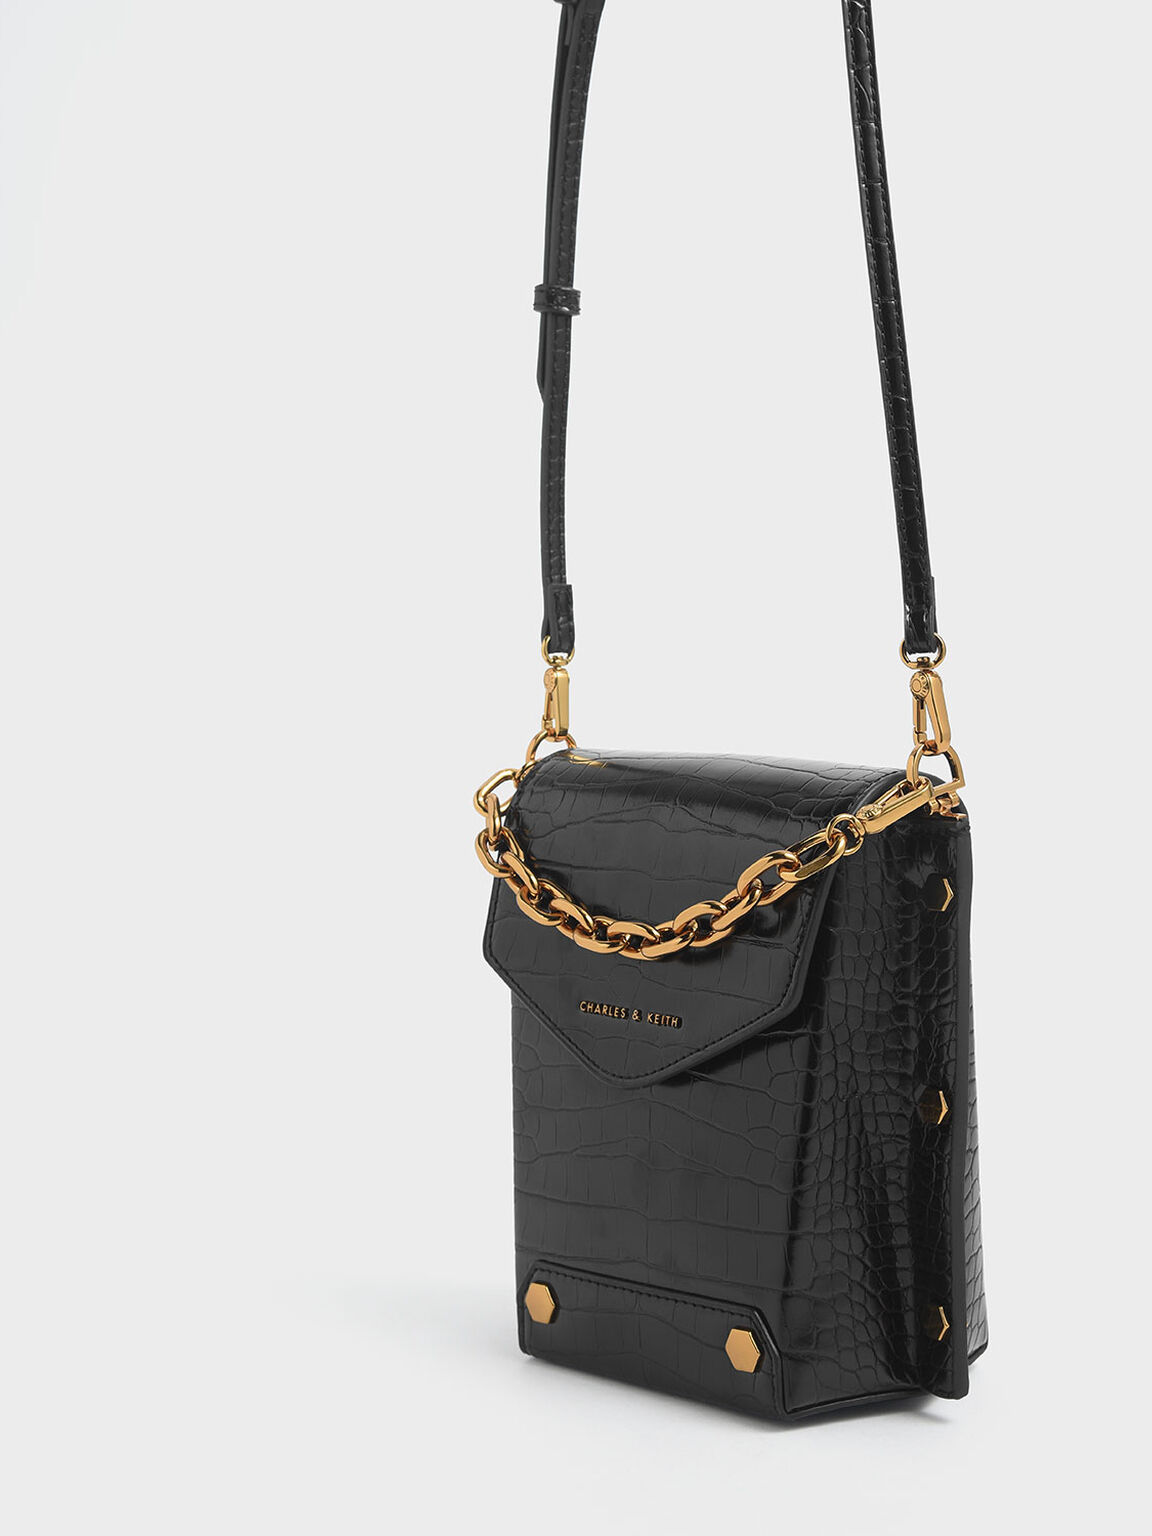 Croc-Effect Stud Detail Bag, Black, hi-res